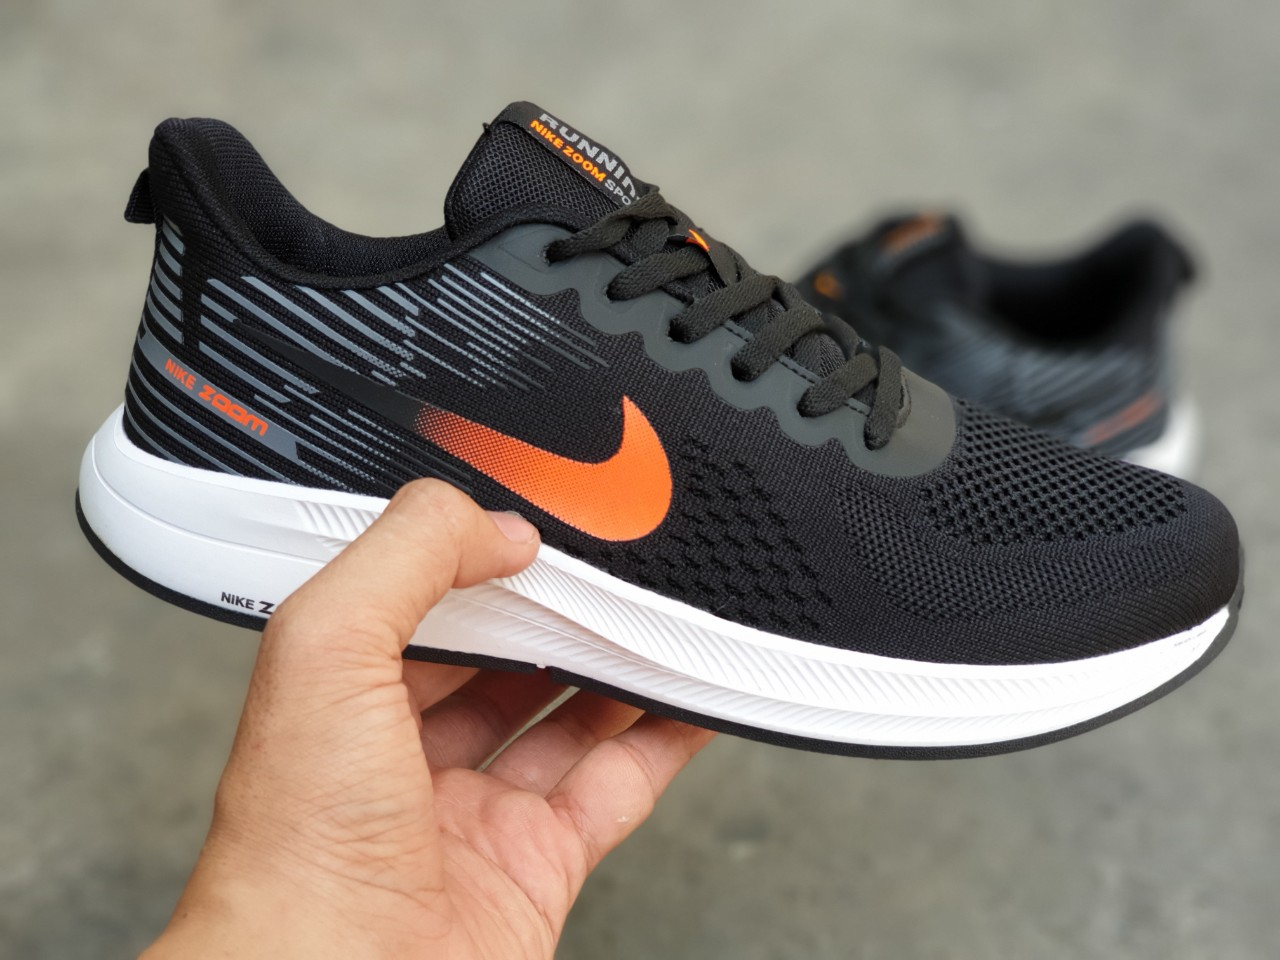 Giày Nike nam zoom đen cam